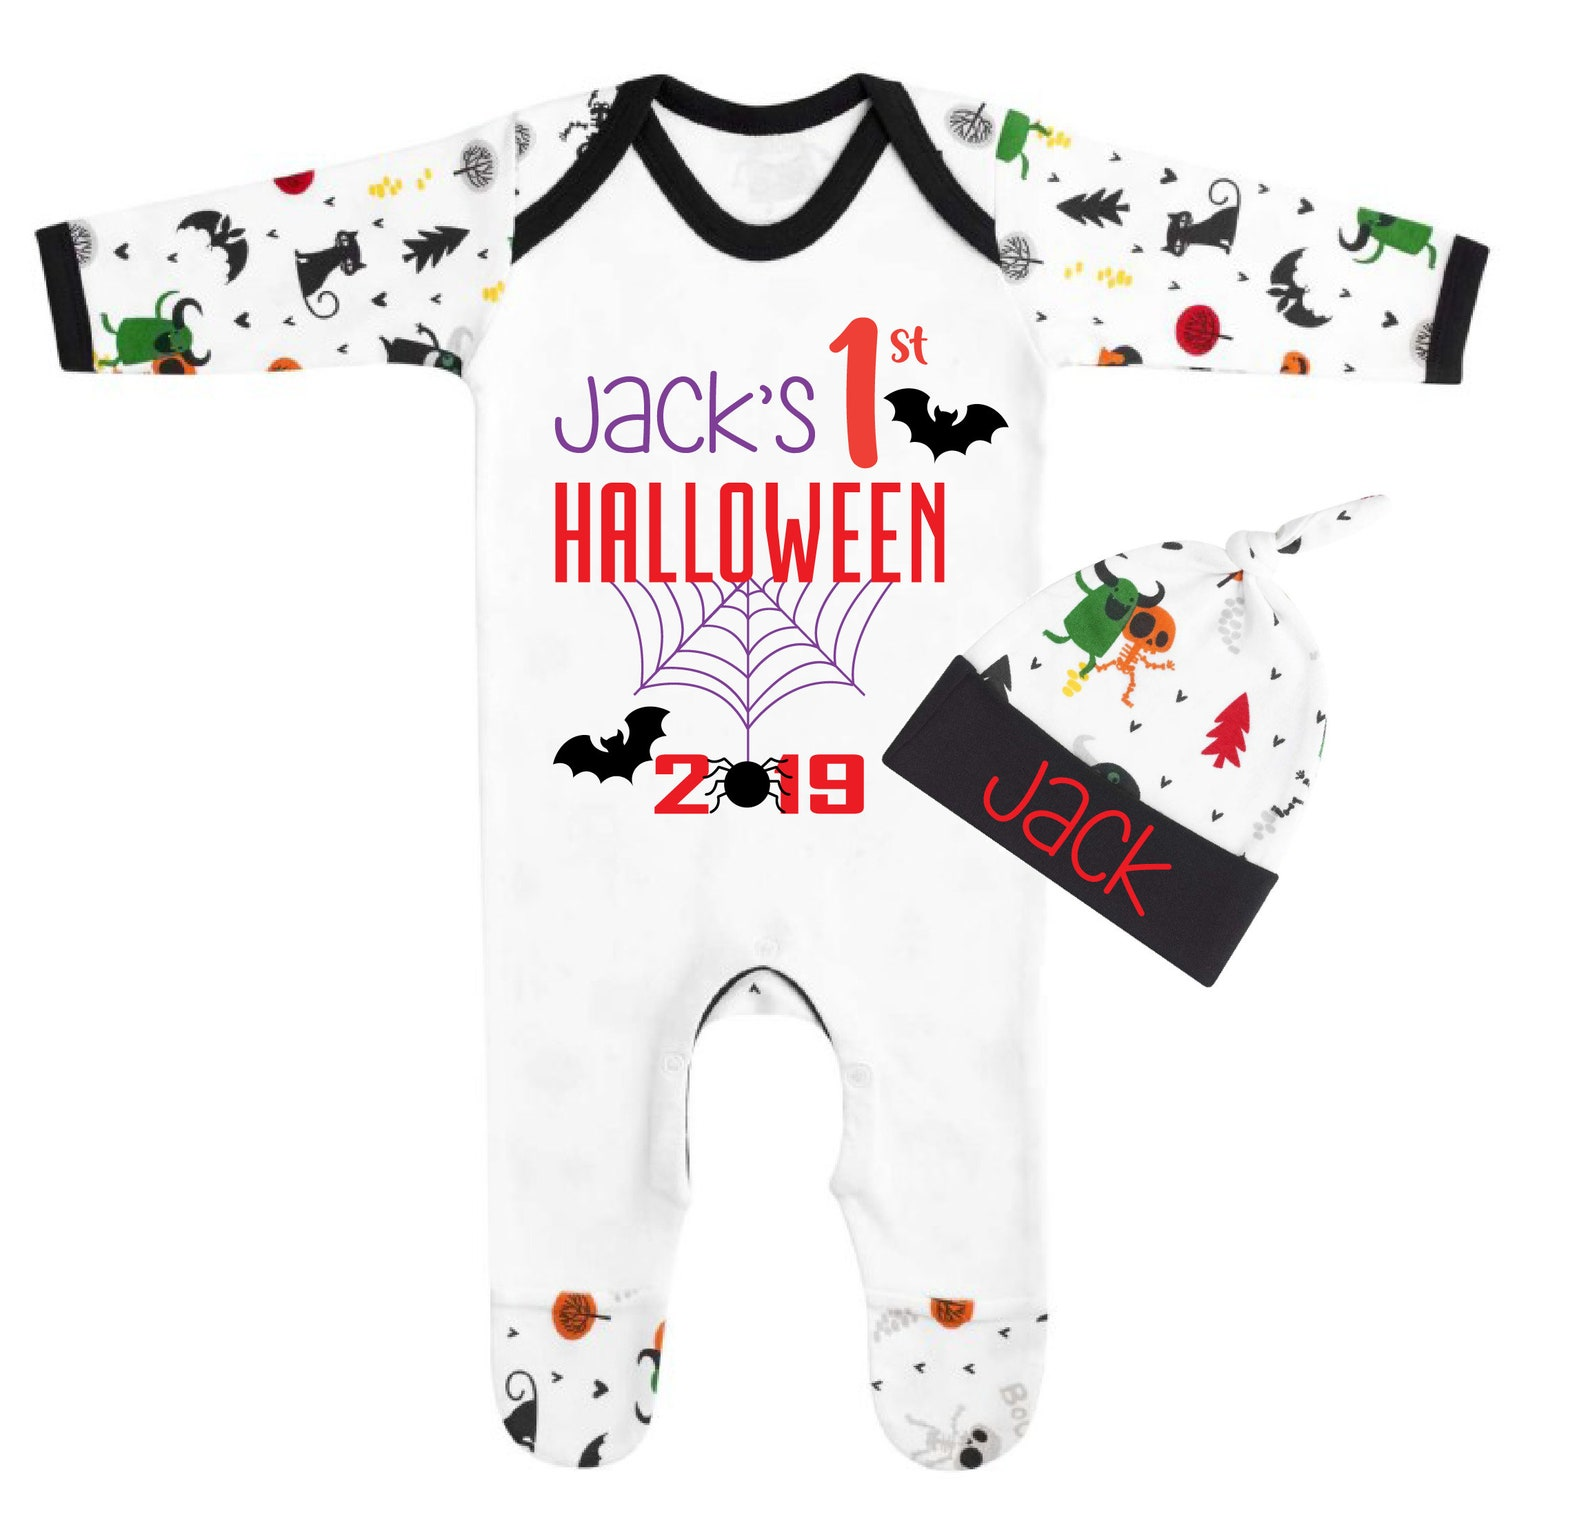 Babies 1st halloween ideas